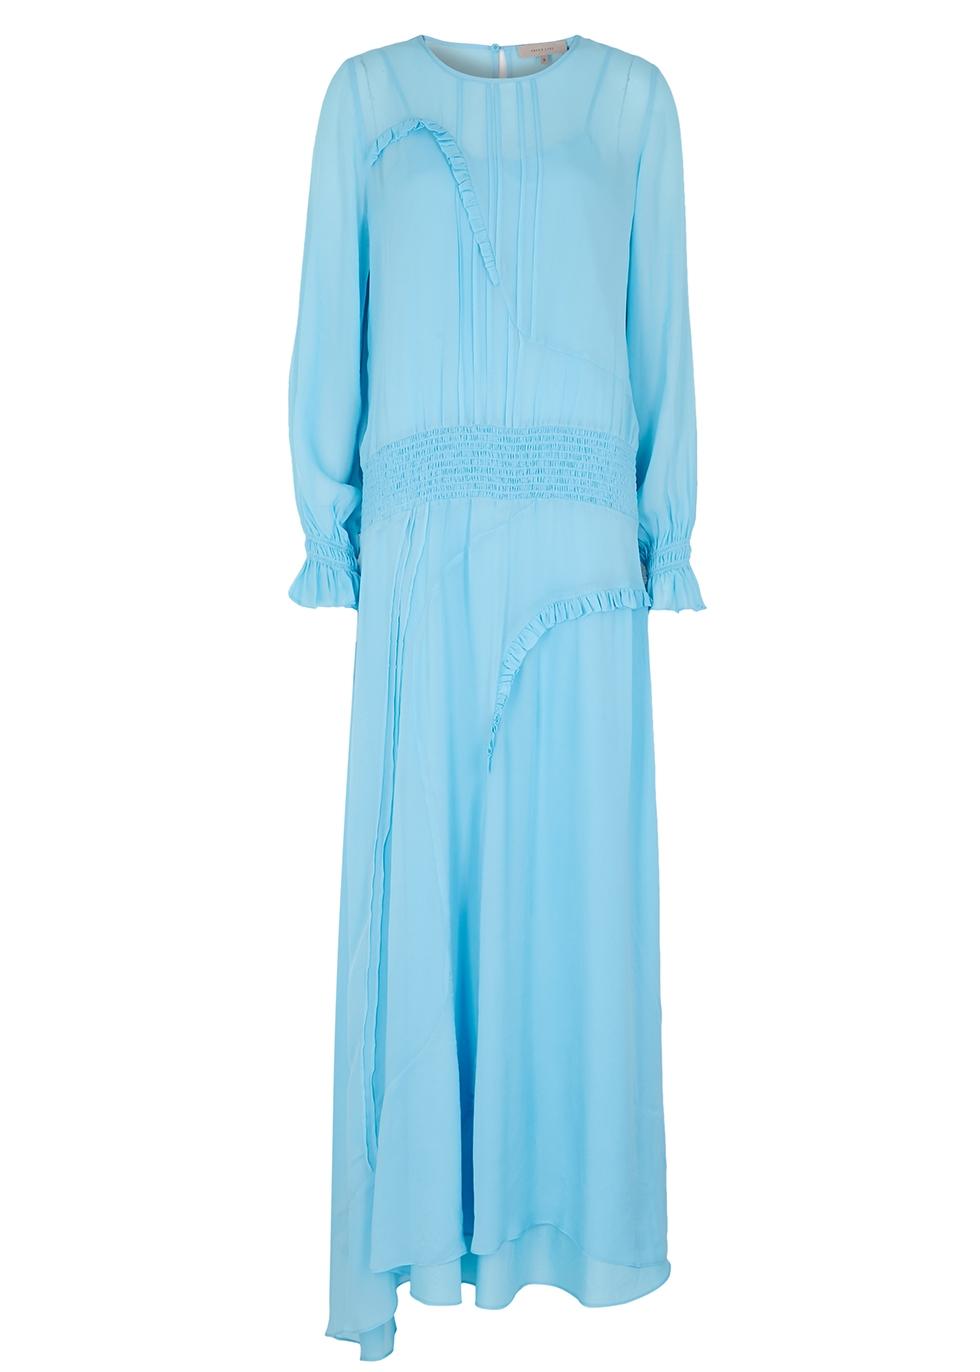 Cornflower blue chiffon maxi dress